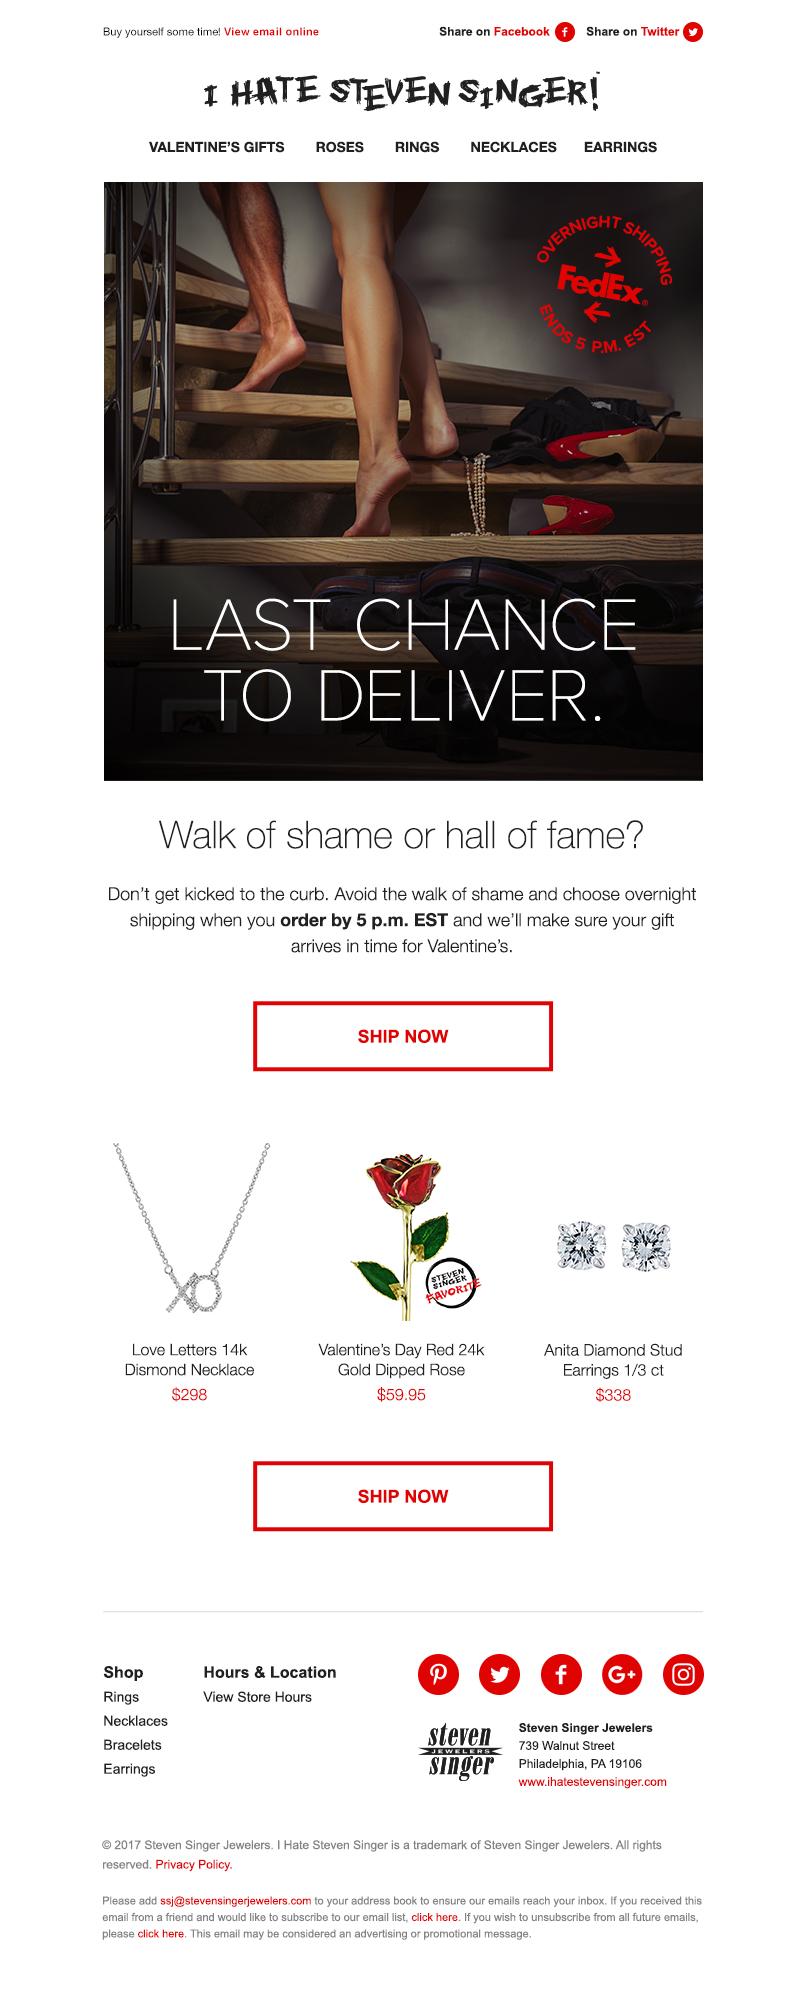 23baaa4e1 Digital Campaigns, Steven Singer Jewelers — Melanie Taube